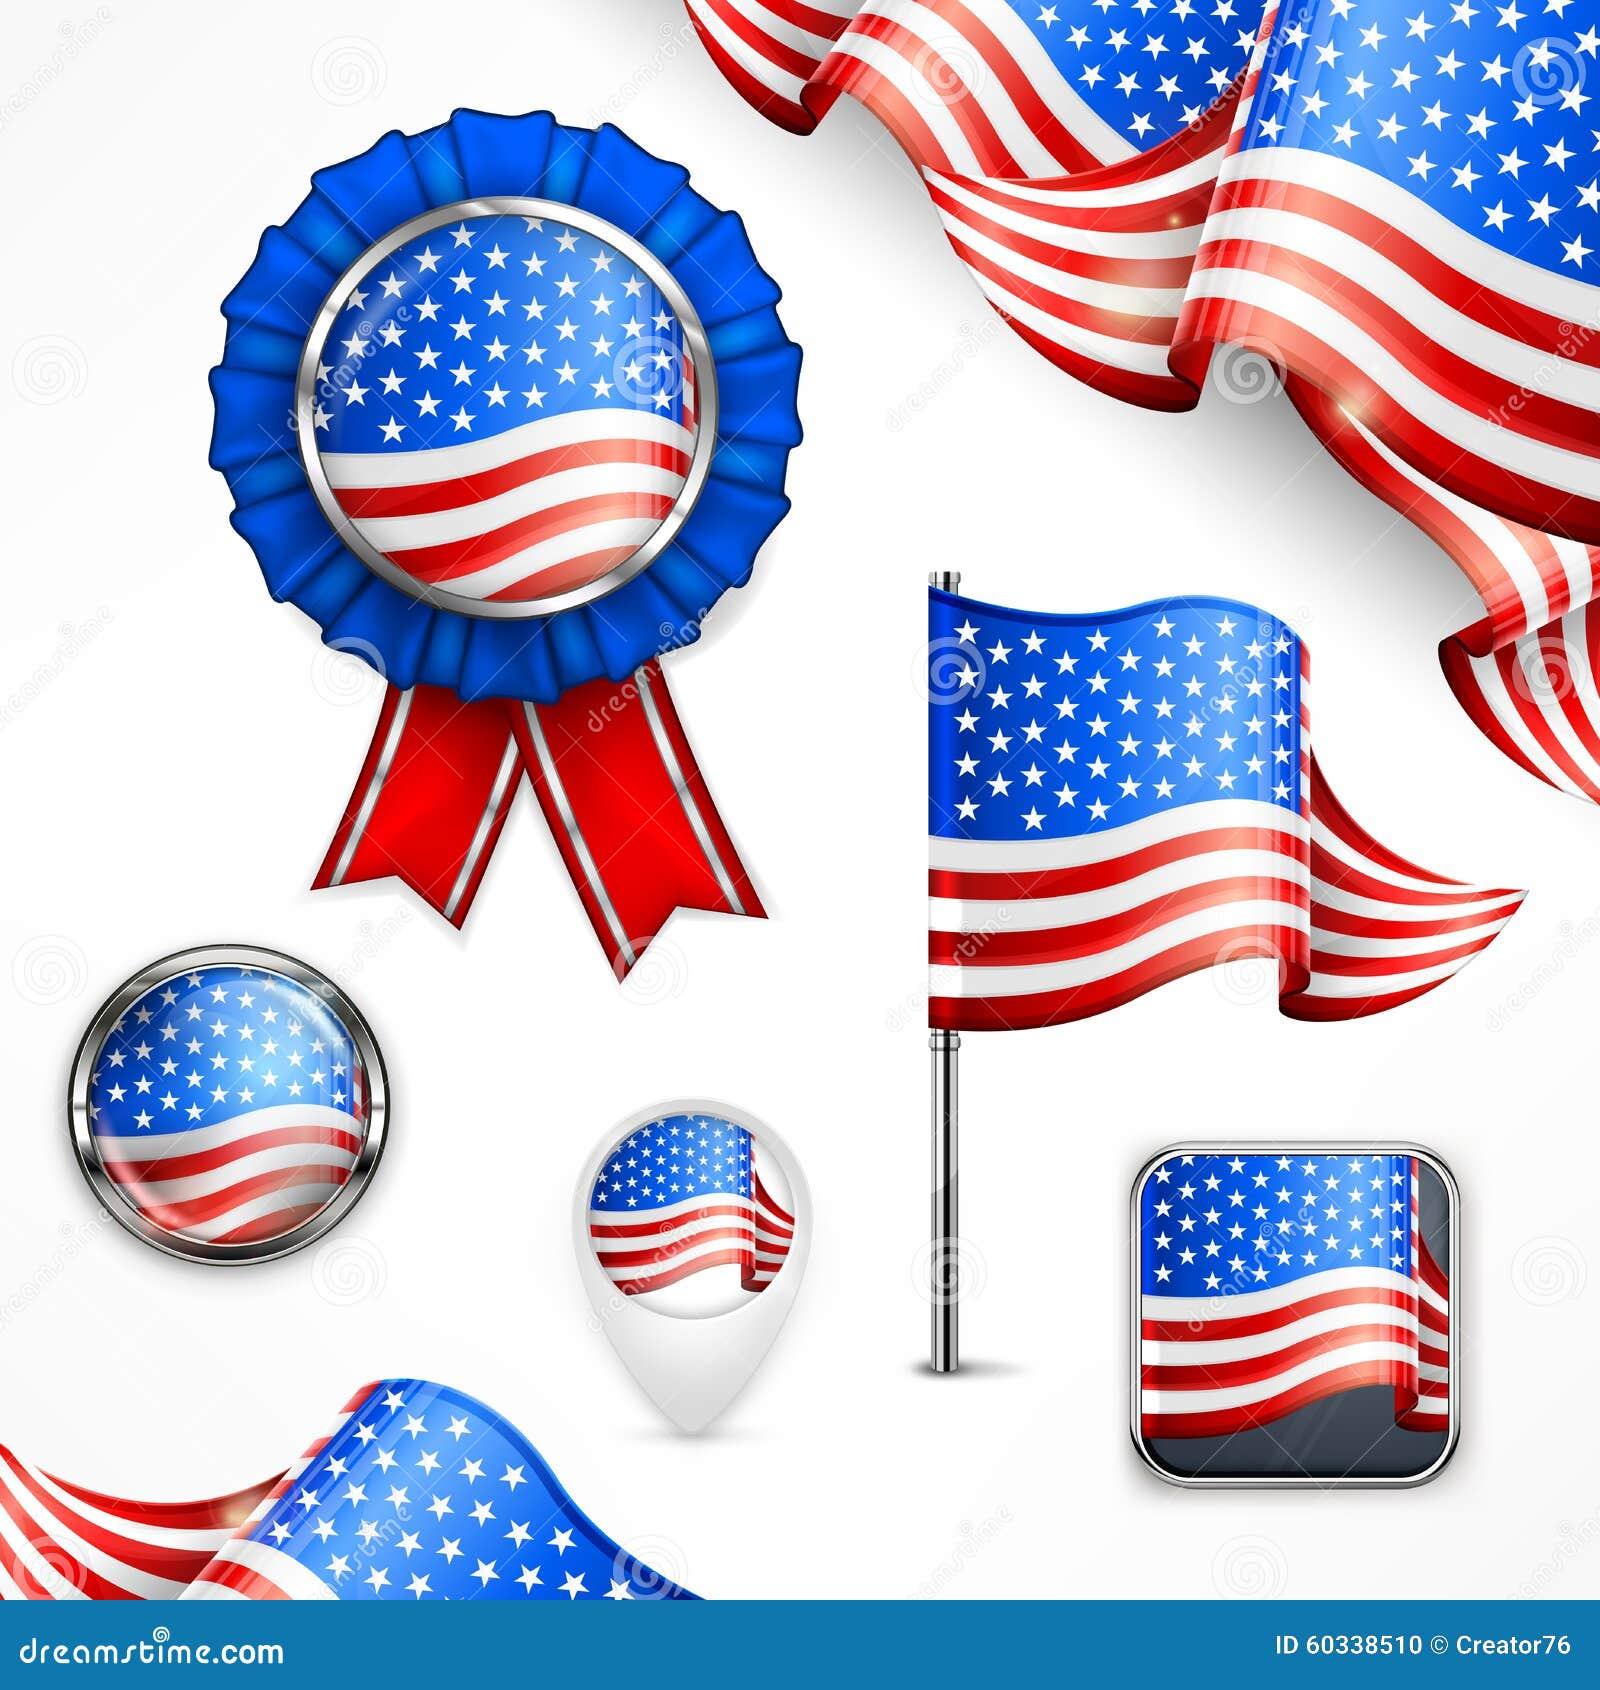 American national symbols stock vector illustration of flag american national symbols biocorpaavc